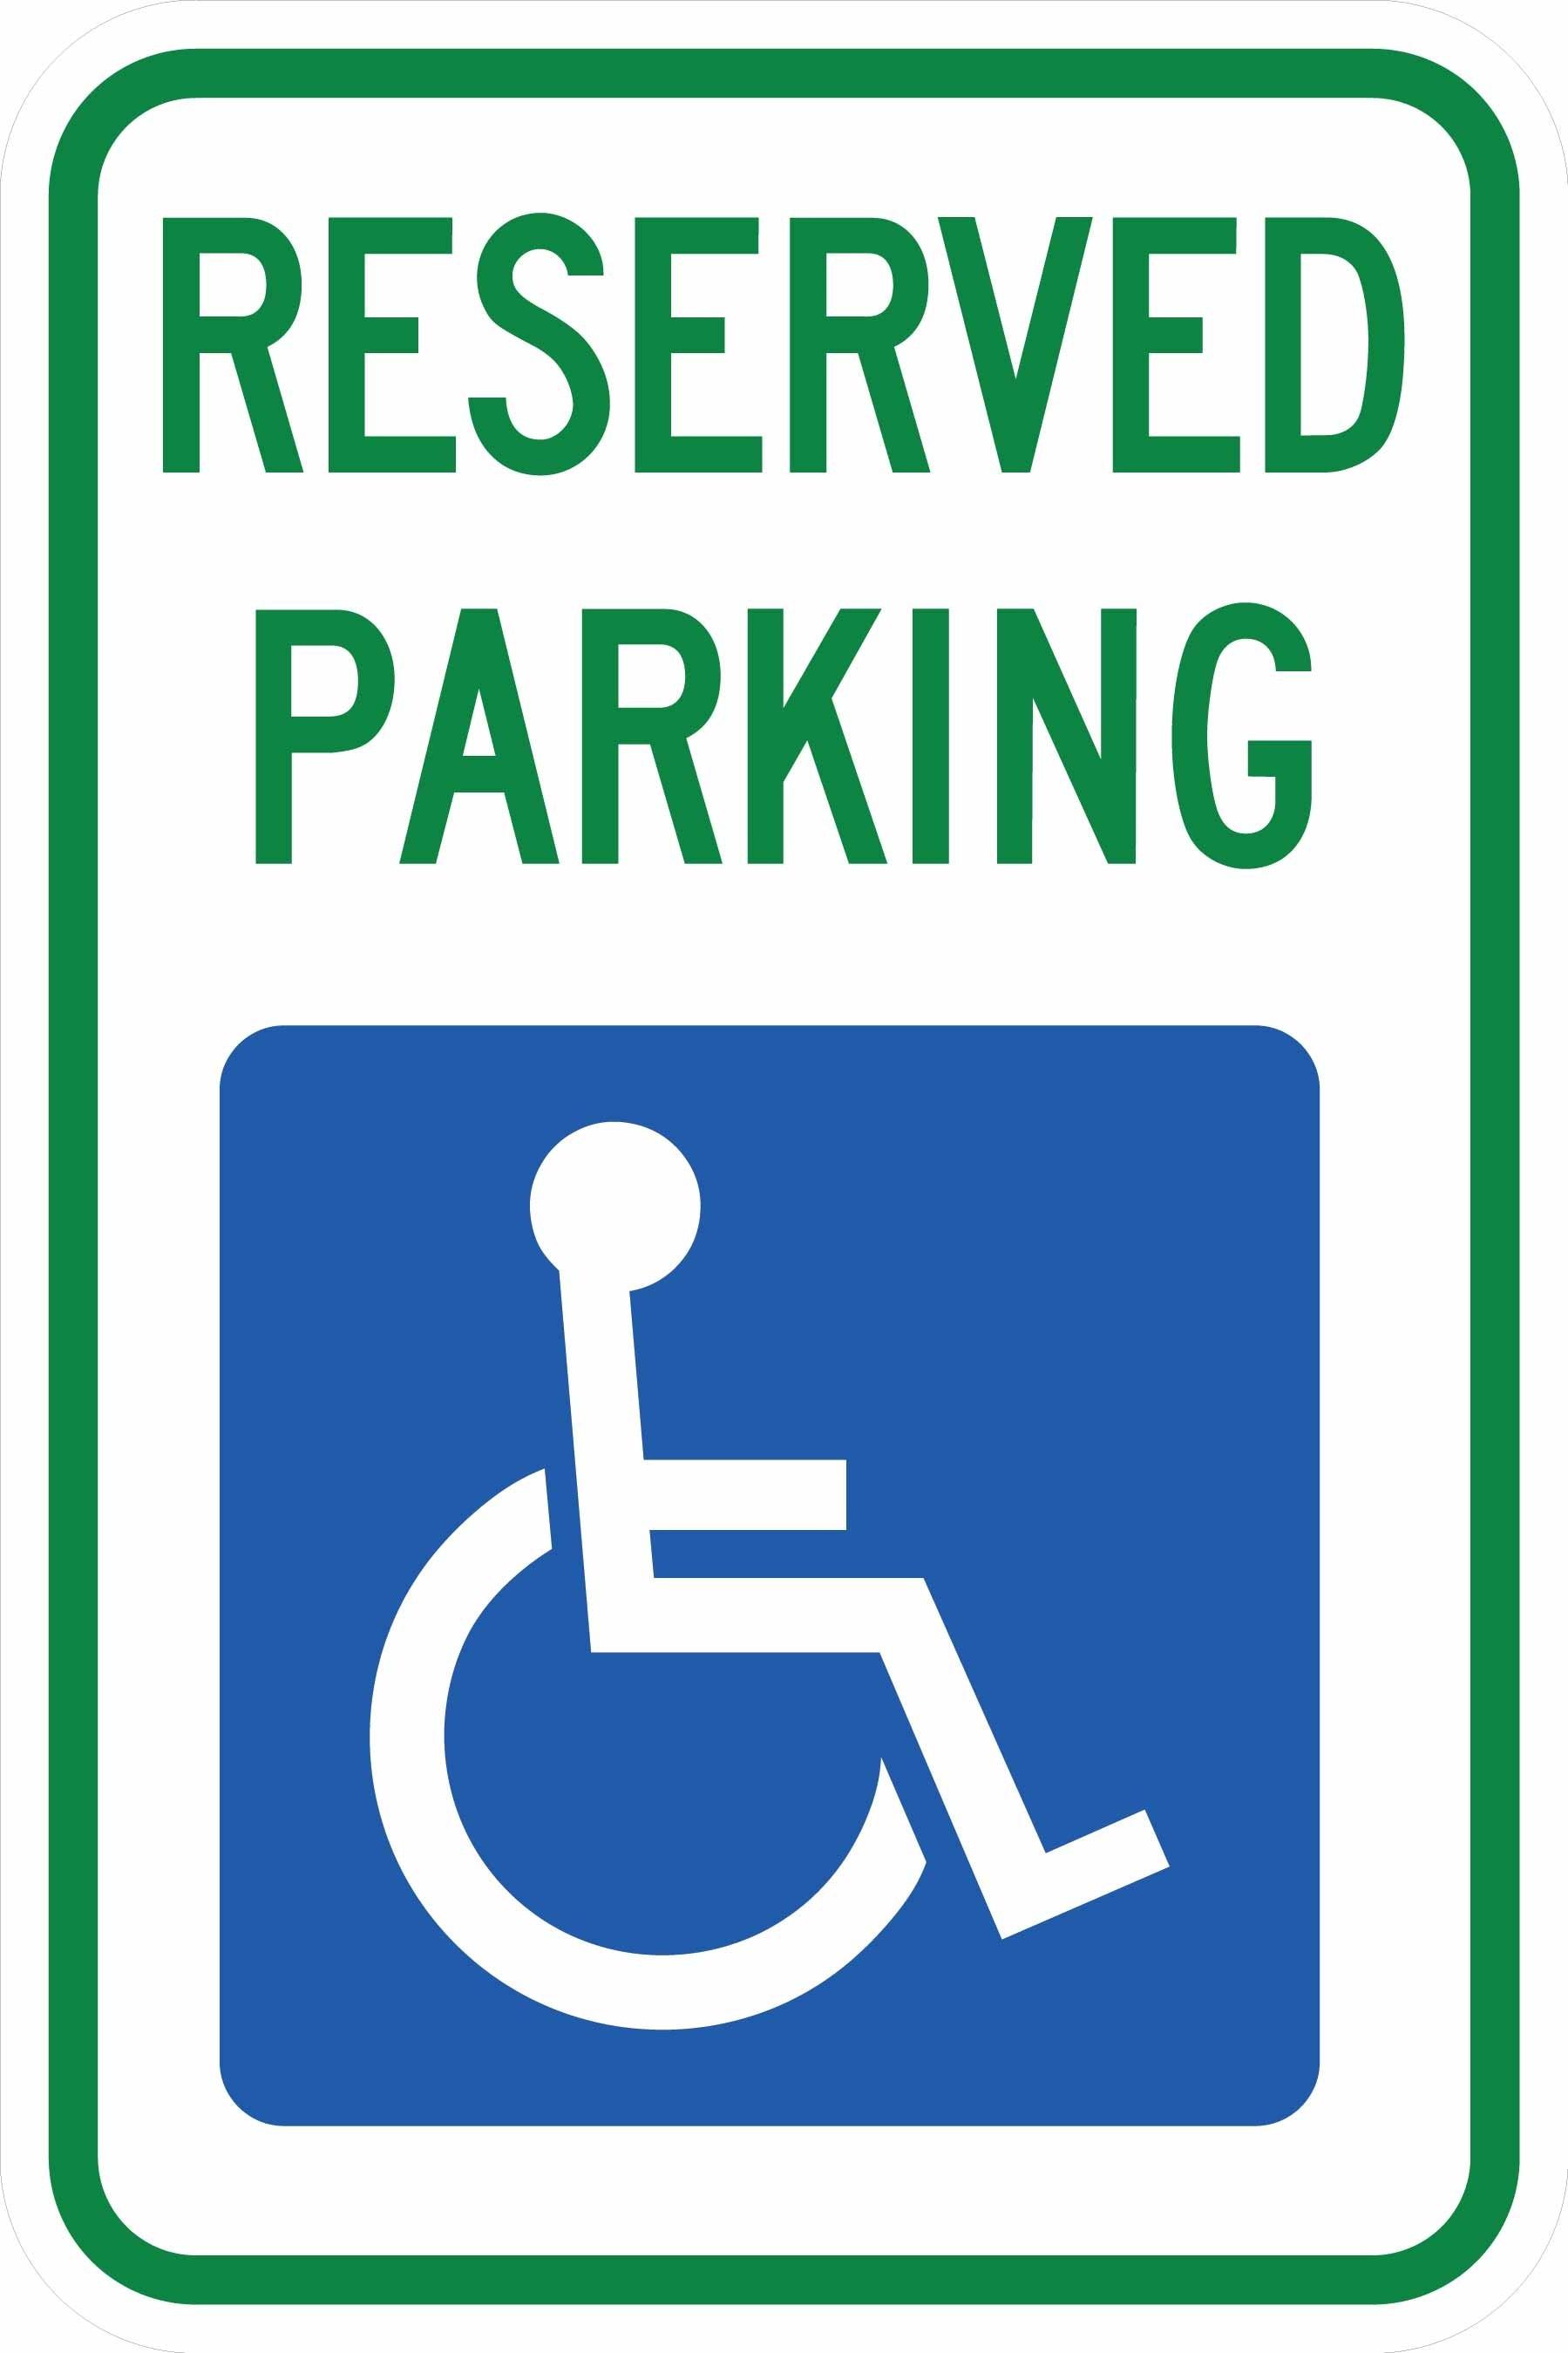 South Dakota Handicap Parking Sign R7-8 sd